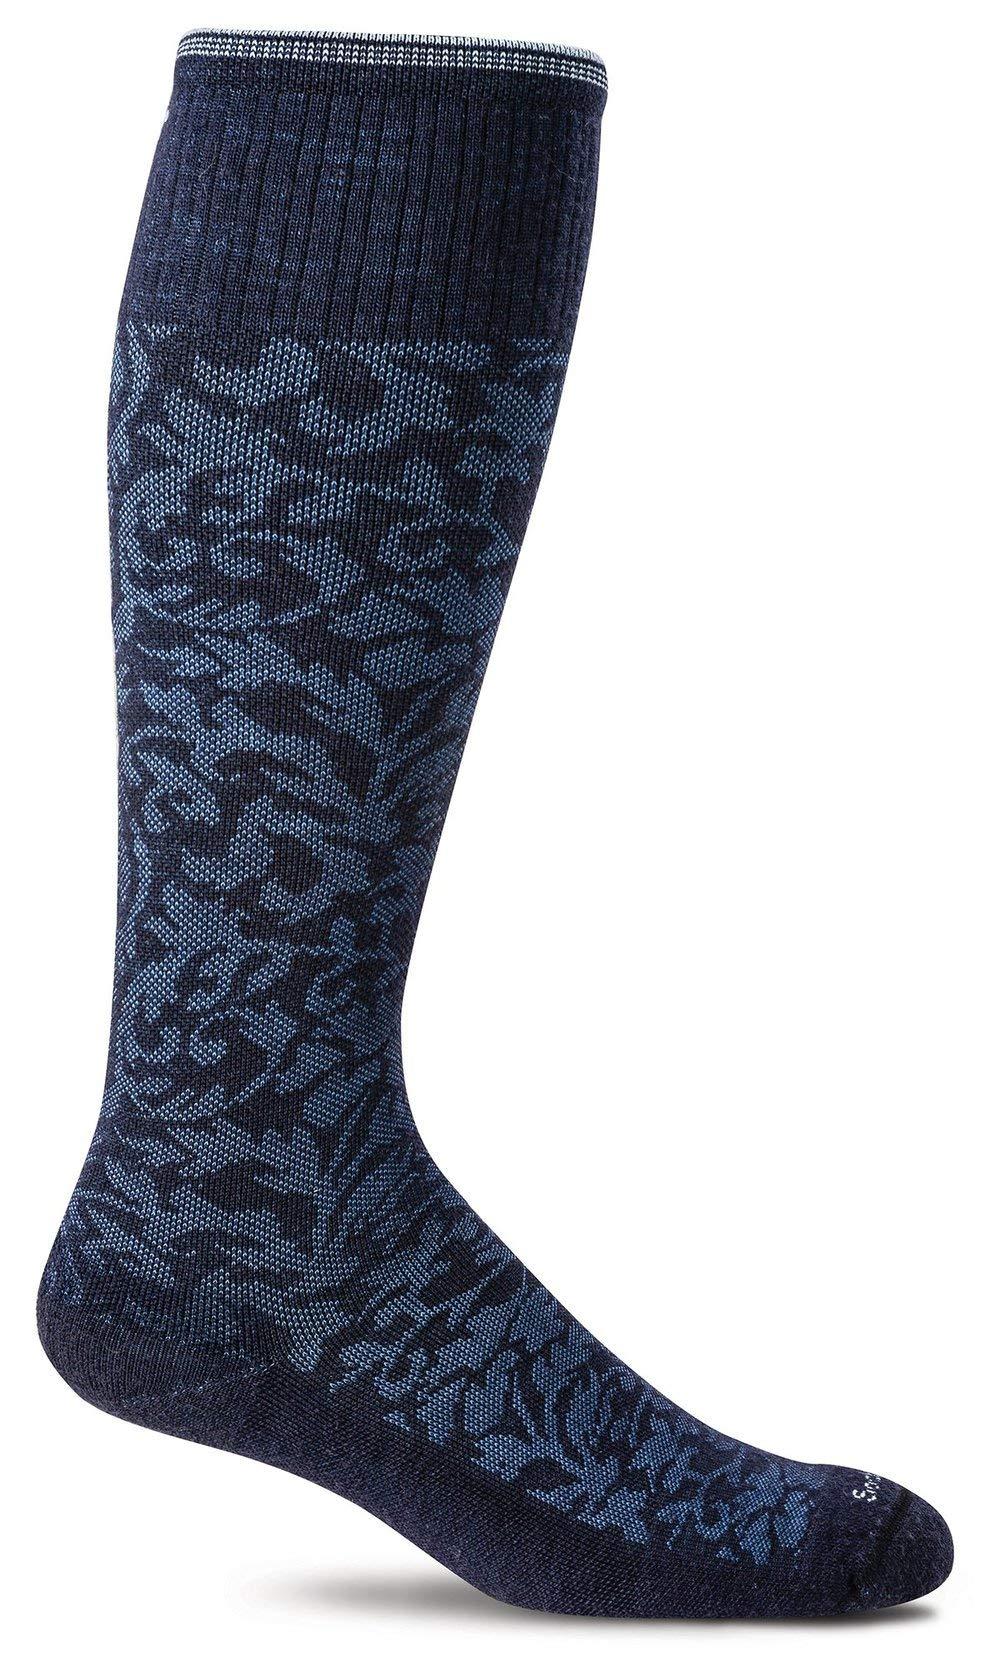 Sockwell Women's Damask Socks, Navy, Small/Medium